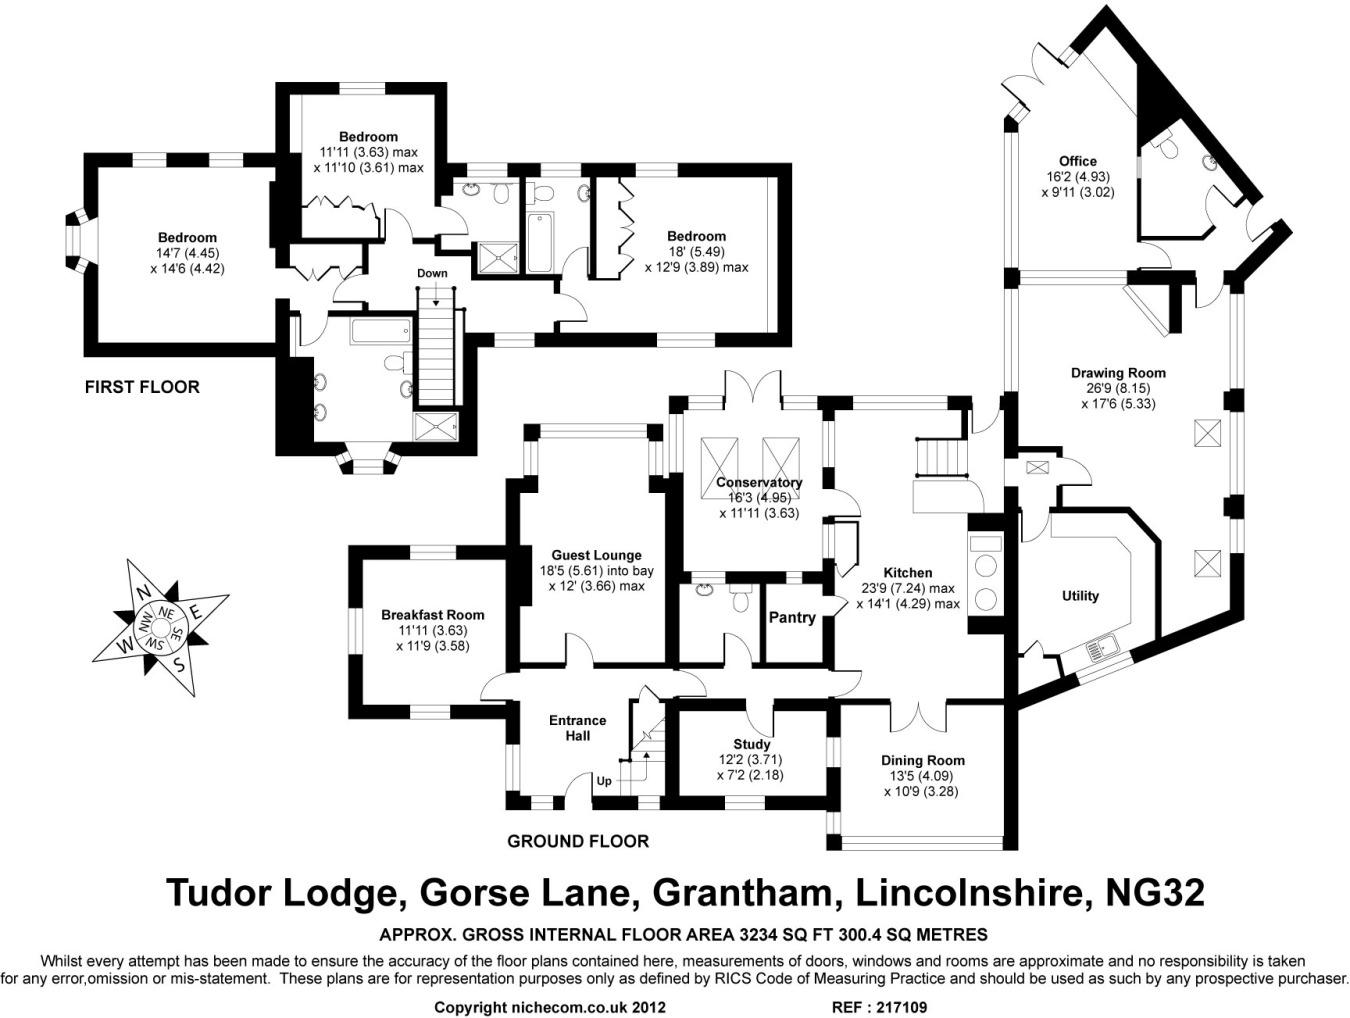 harlaxton manor floor plan trend home design and decor